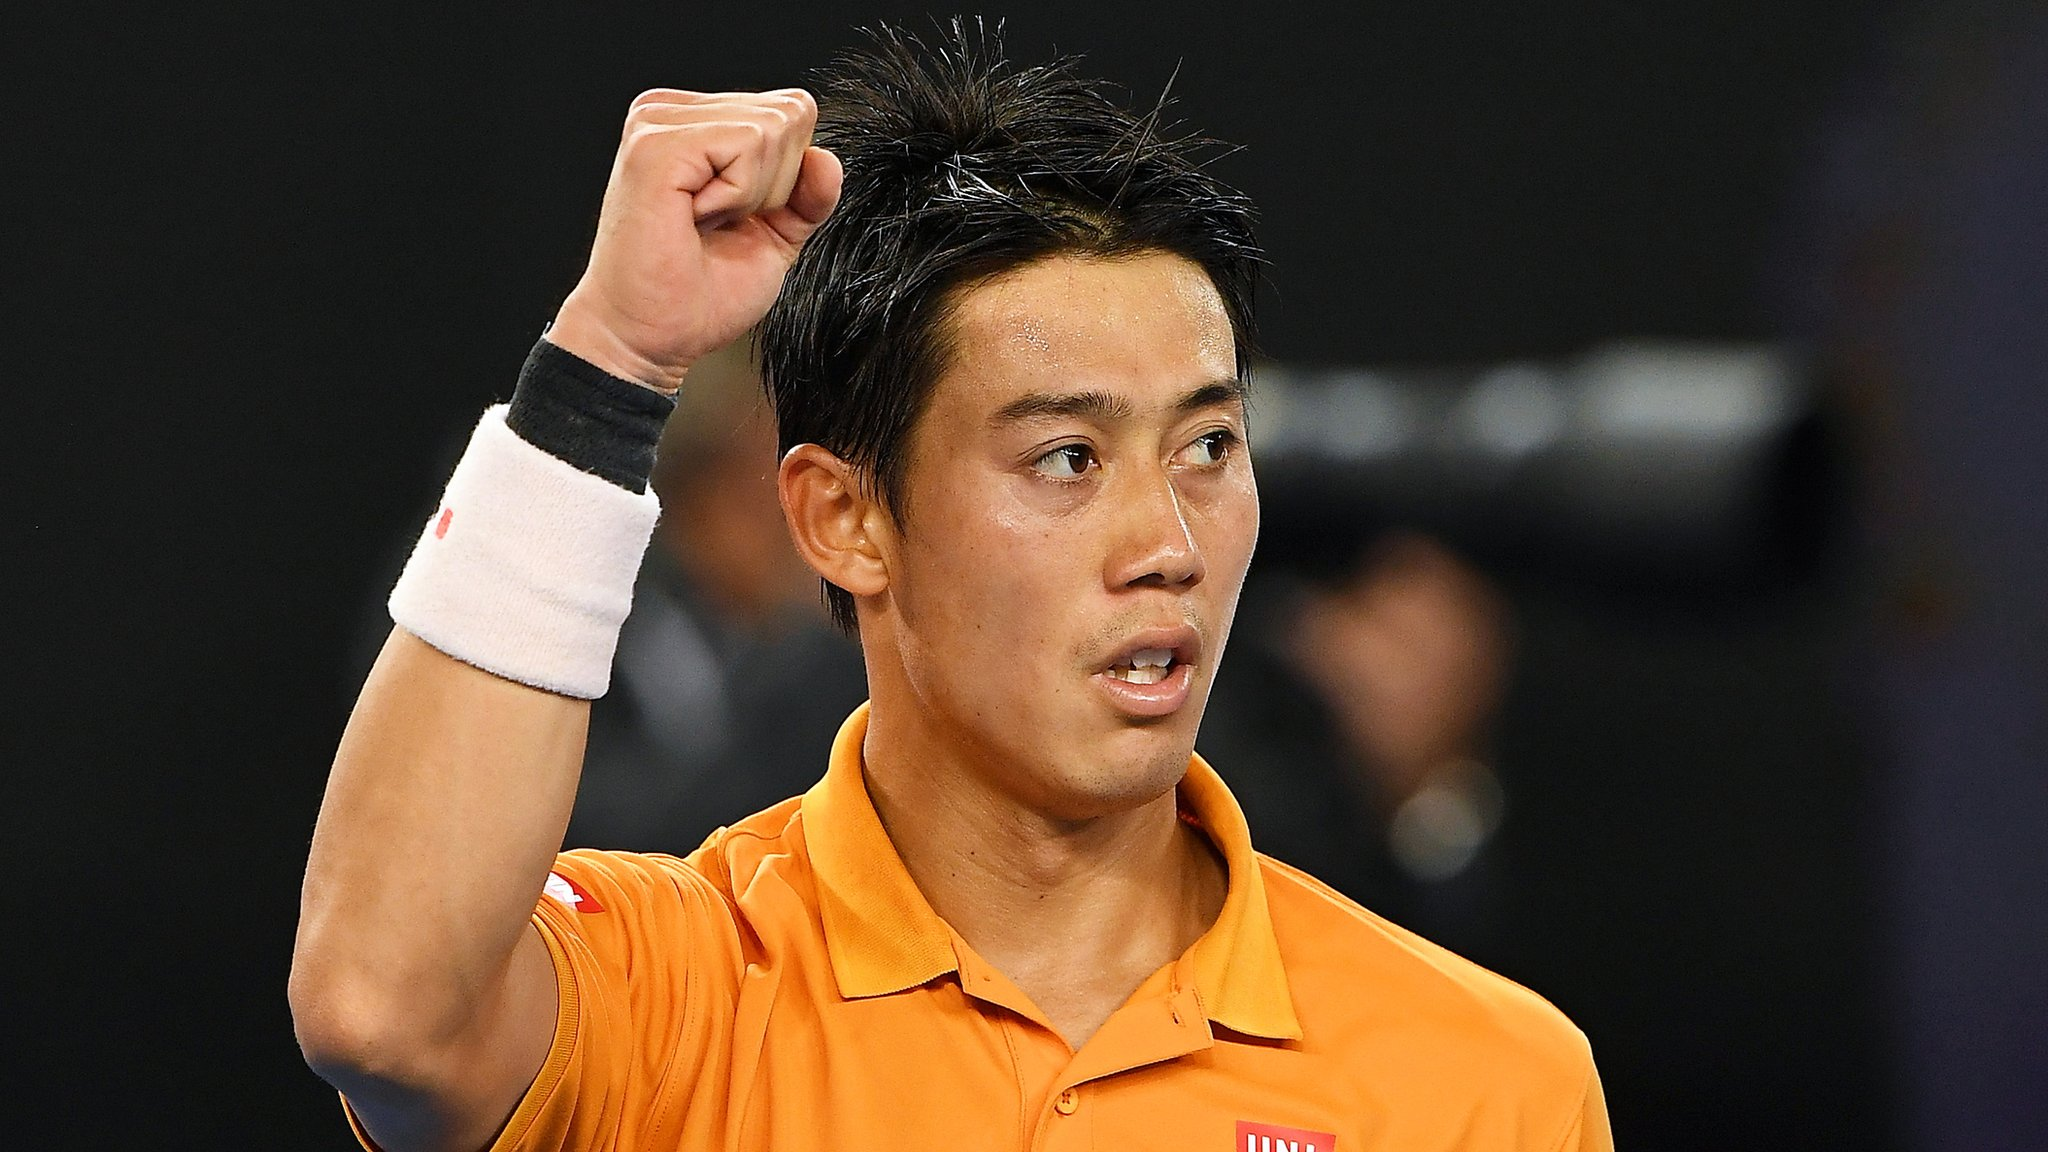 Australian Open: Kei Nishikori through after five-set win over Pablo Carreno Busta